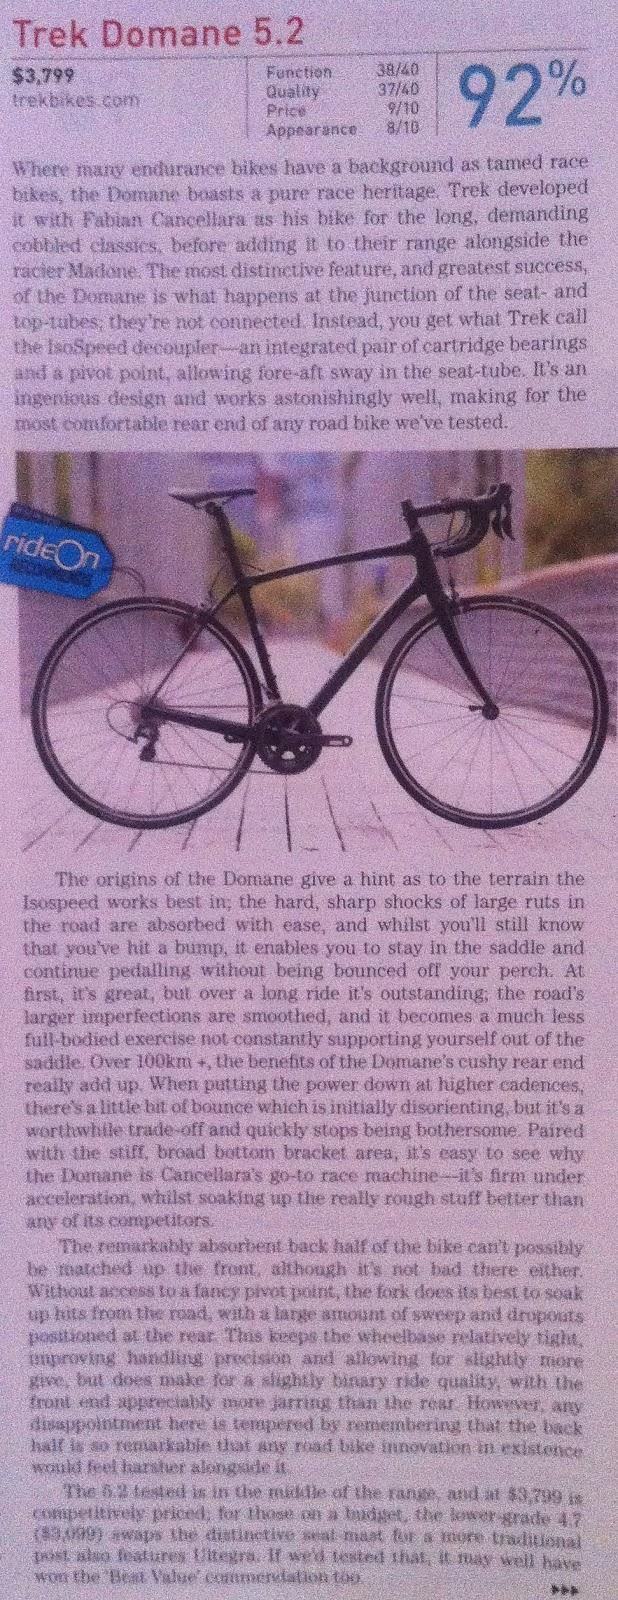 Domane5.2 Review